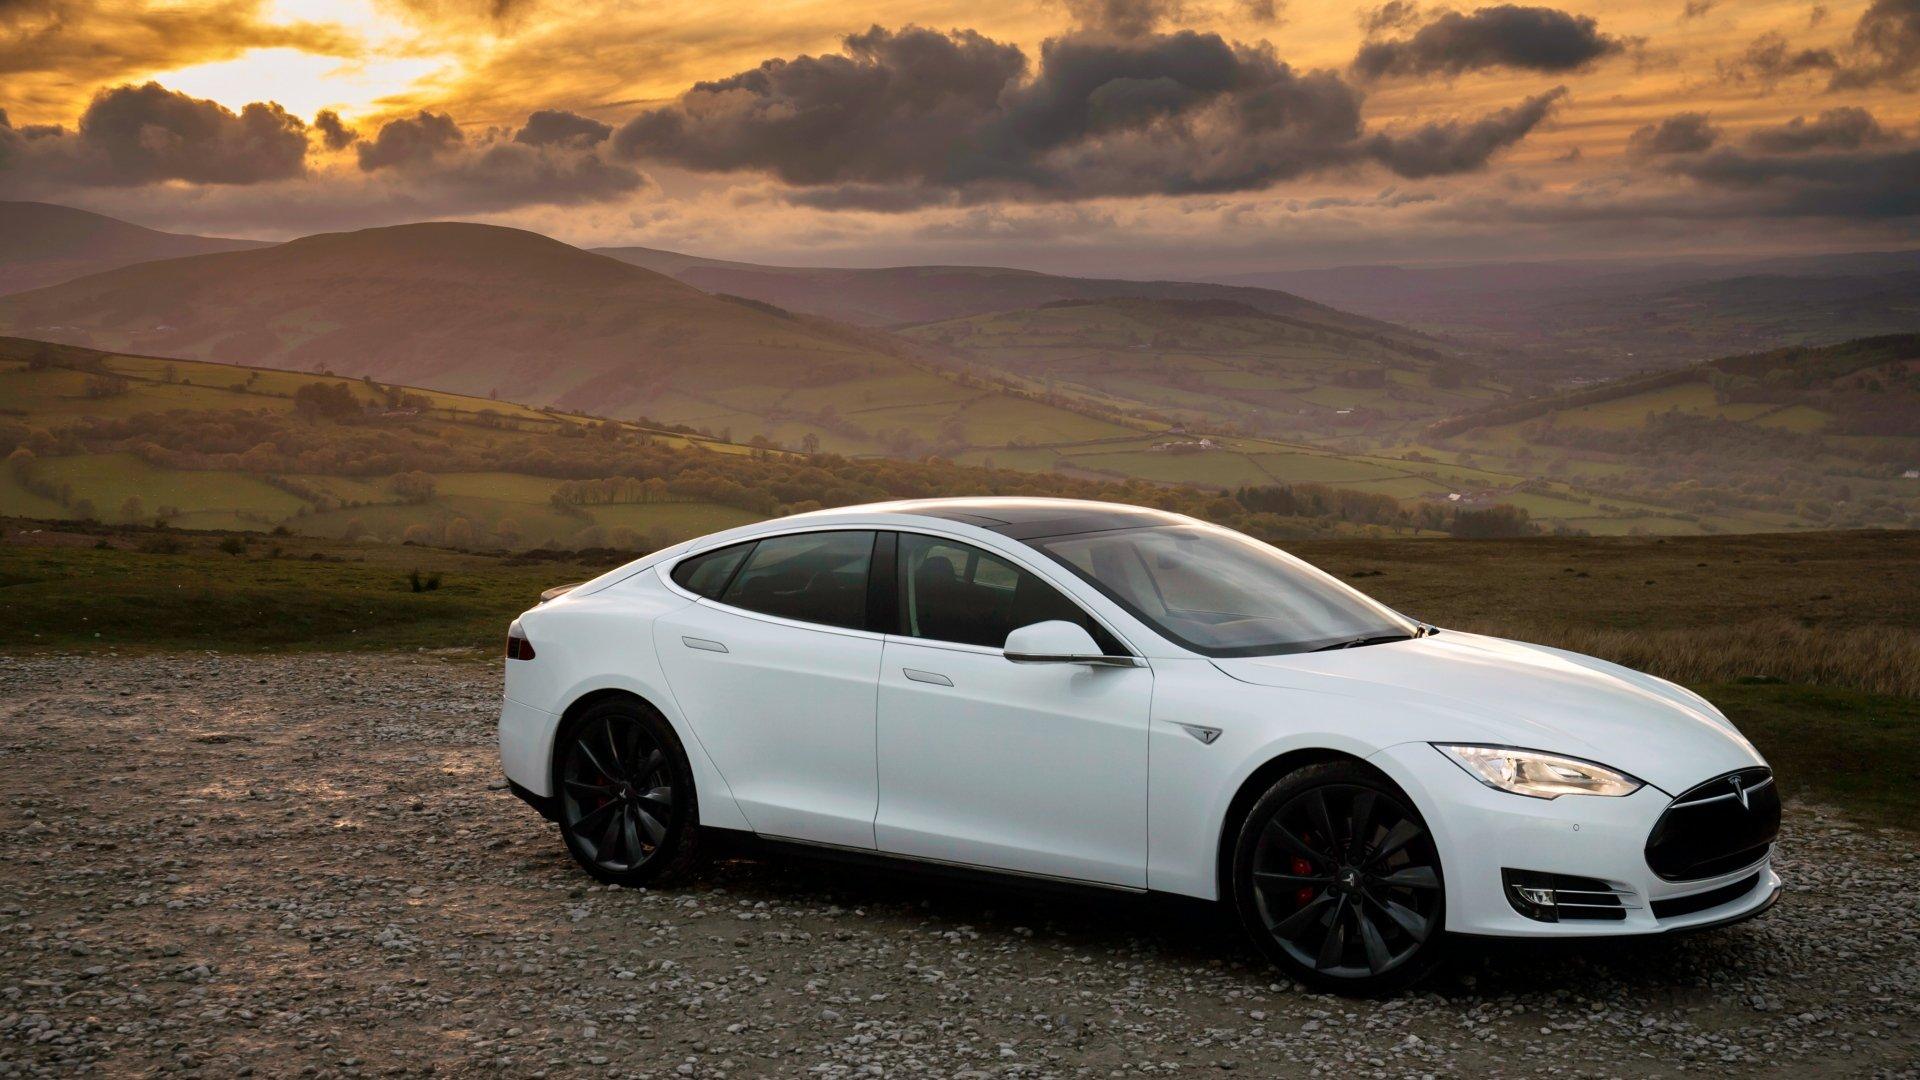 Tesla HD 1080 wallpaper